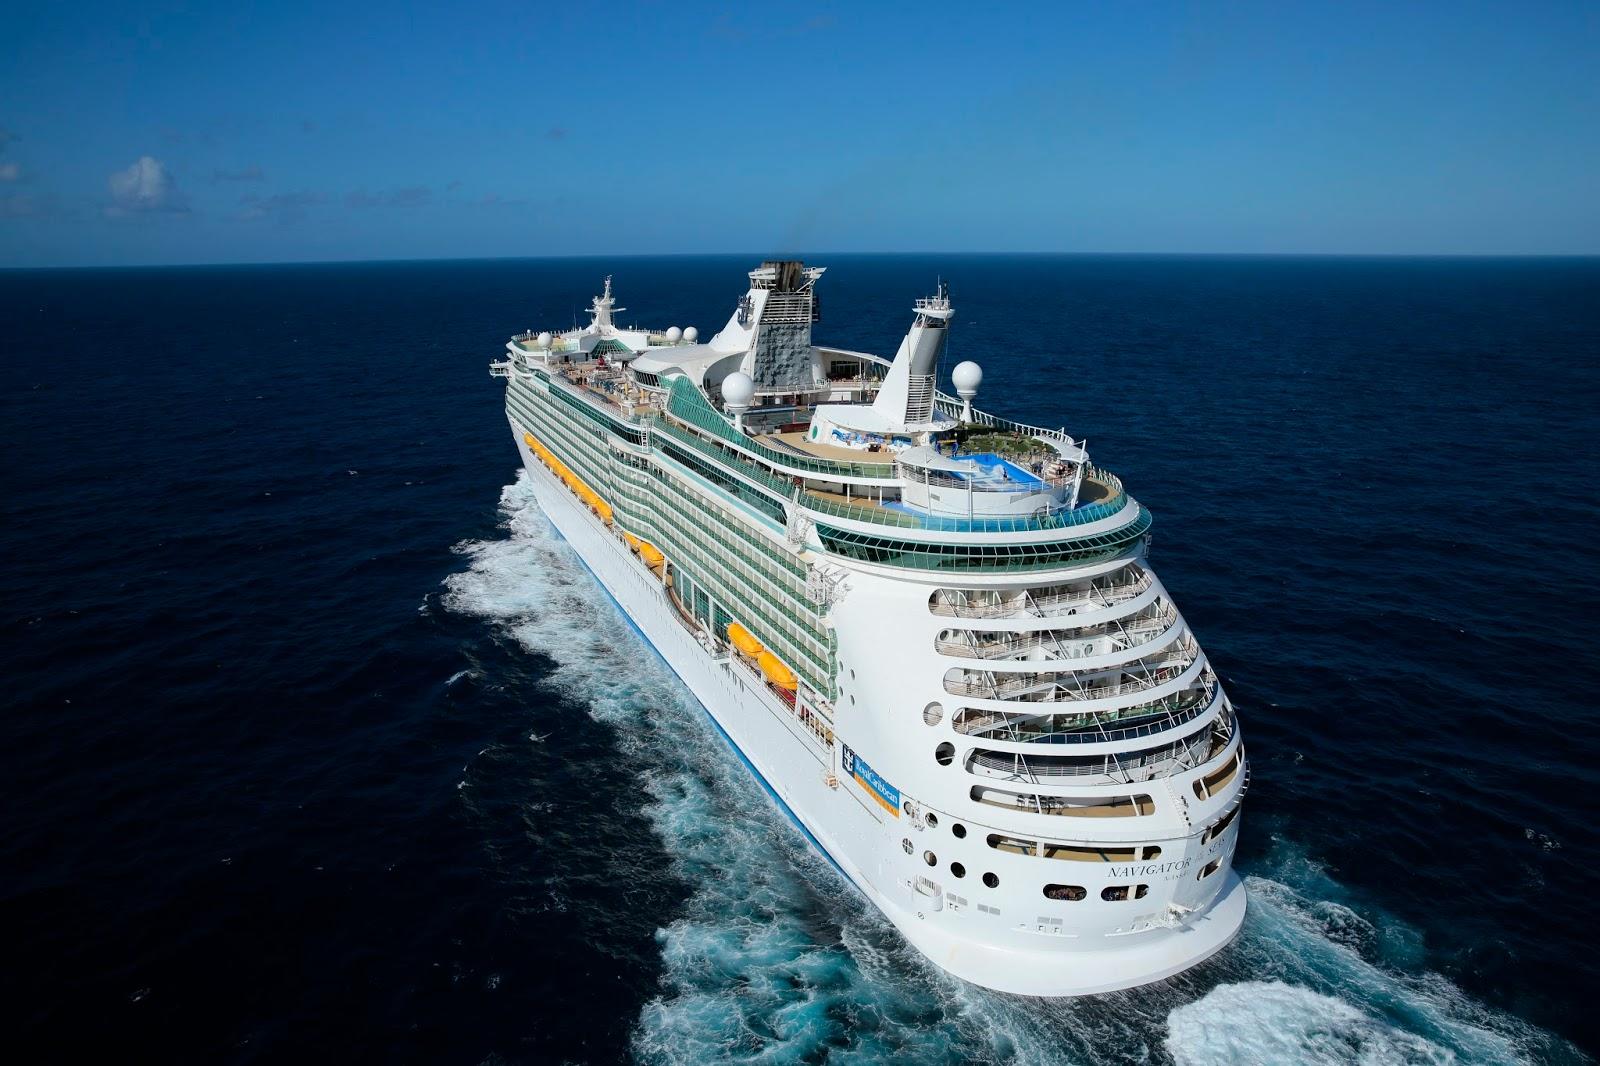 Ray U0026 39 S Cruise  U0026 Travel Blog  Navigator Of The Seas Review 9 20 2015